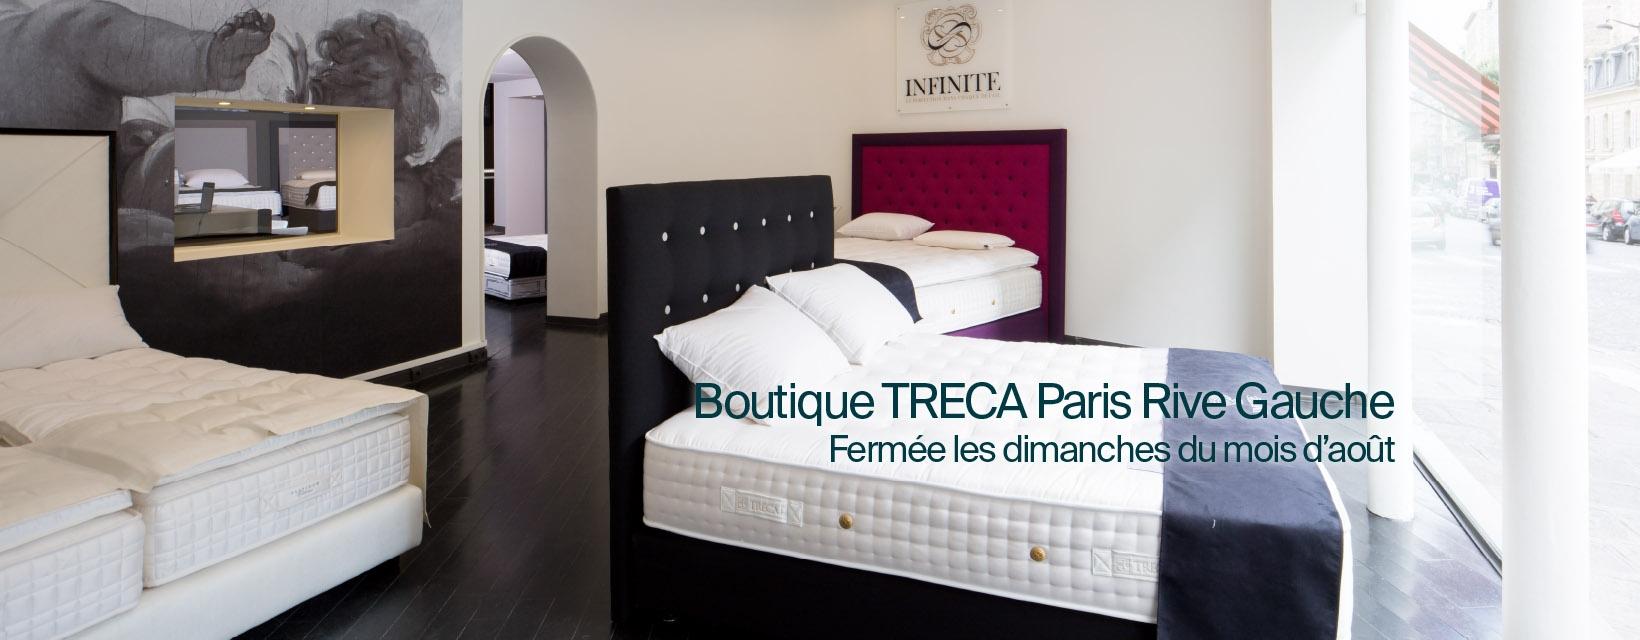 BOUTIQUE TRECA PARIS RIVE GAUCHE